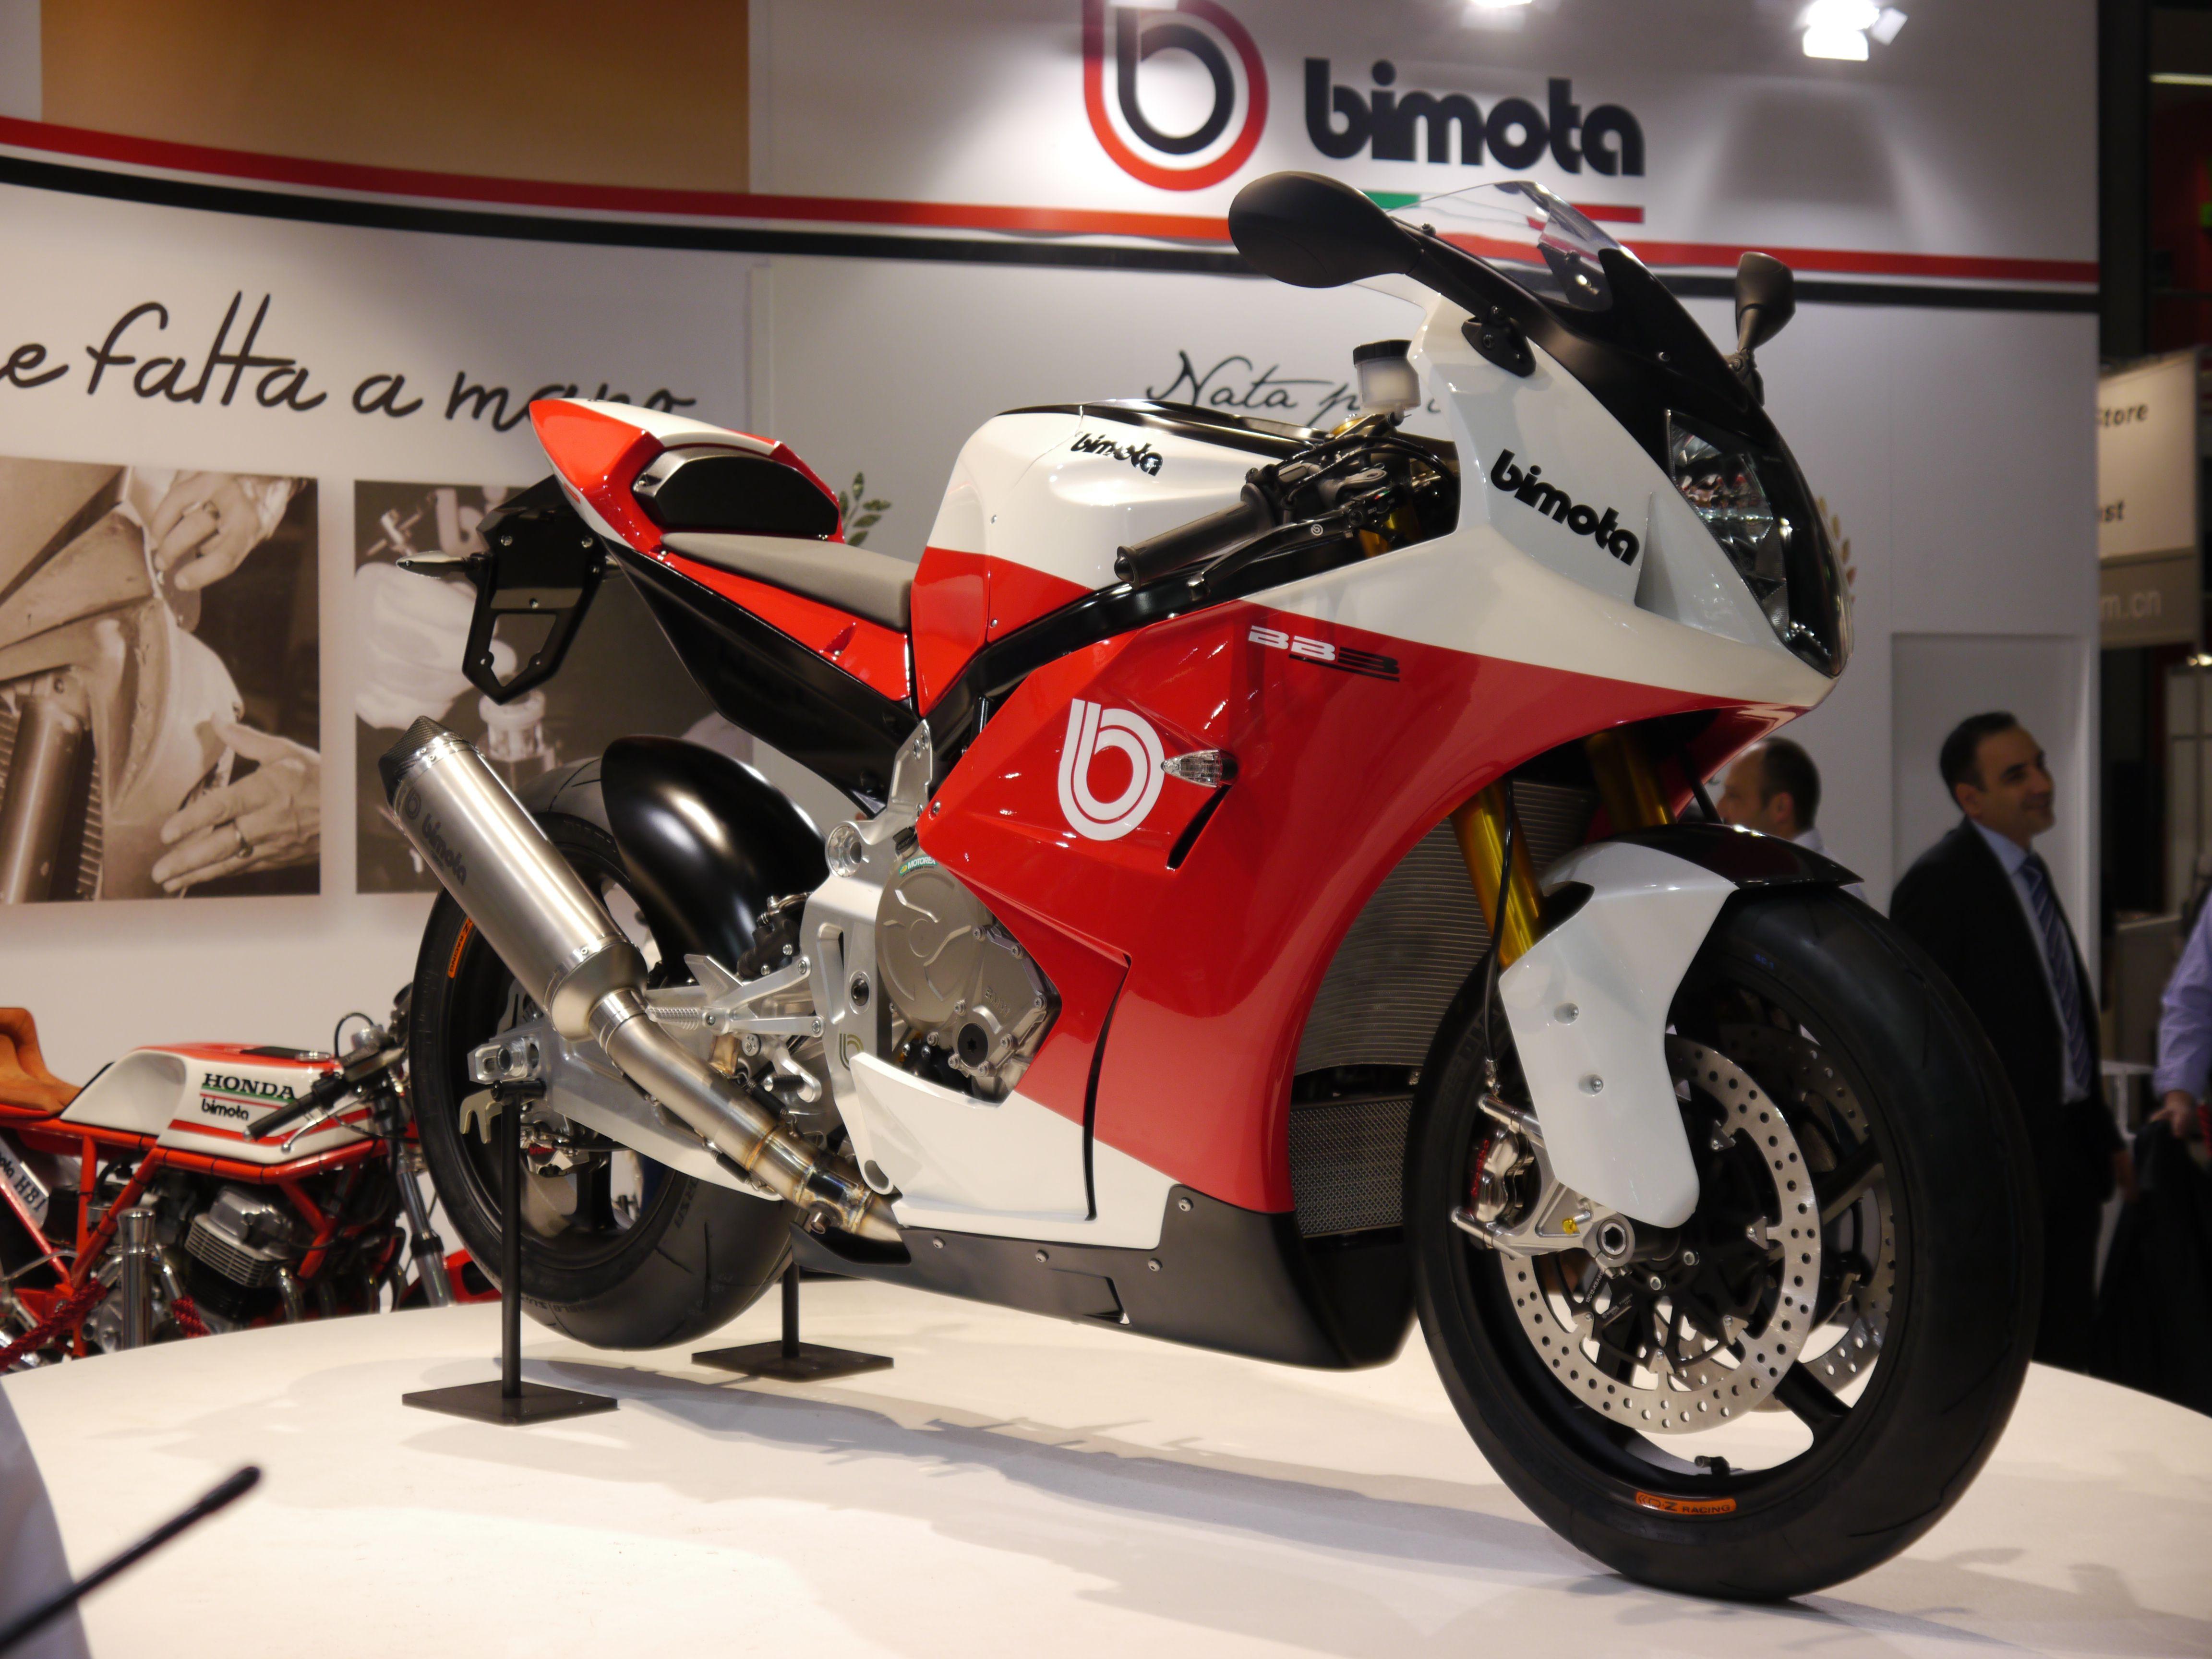 EICMA Motorcycle Show